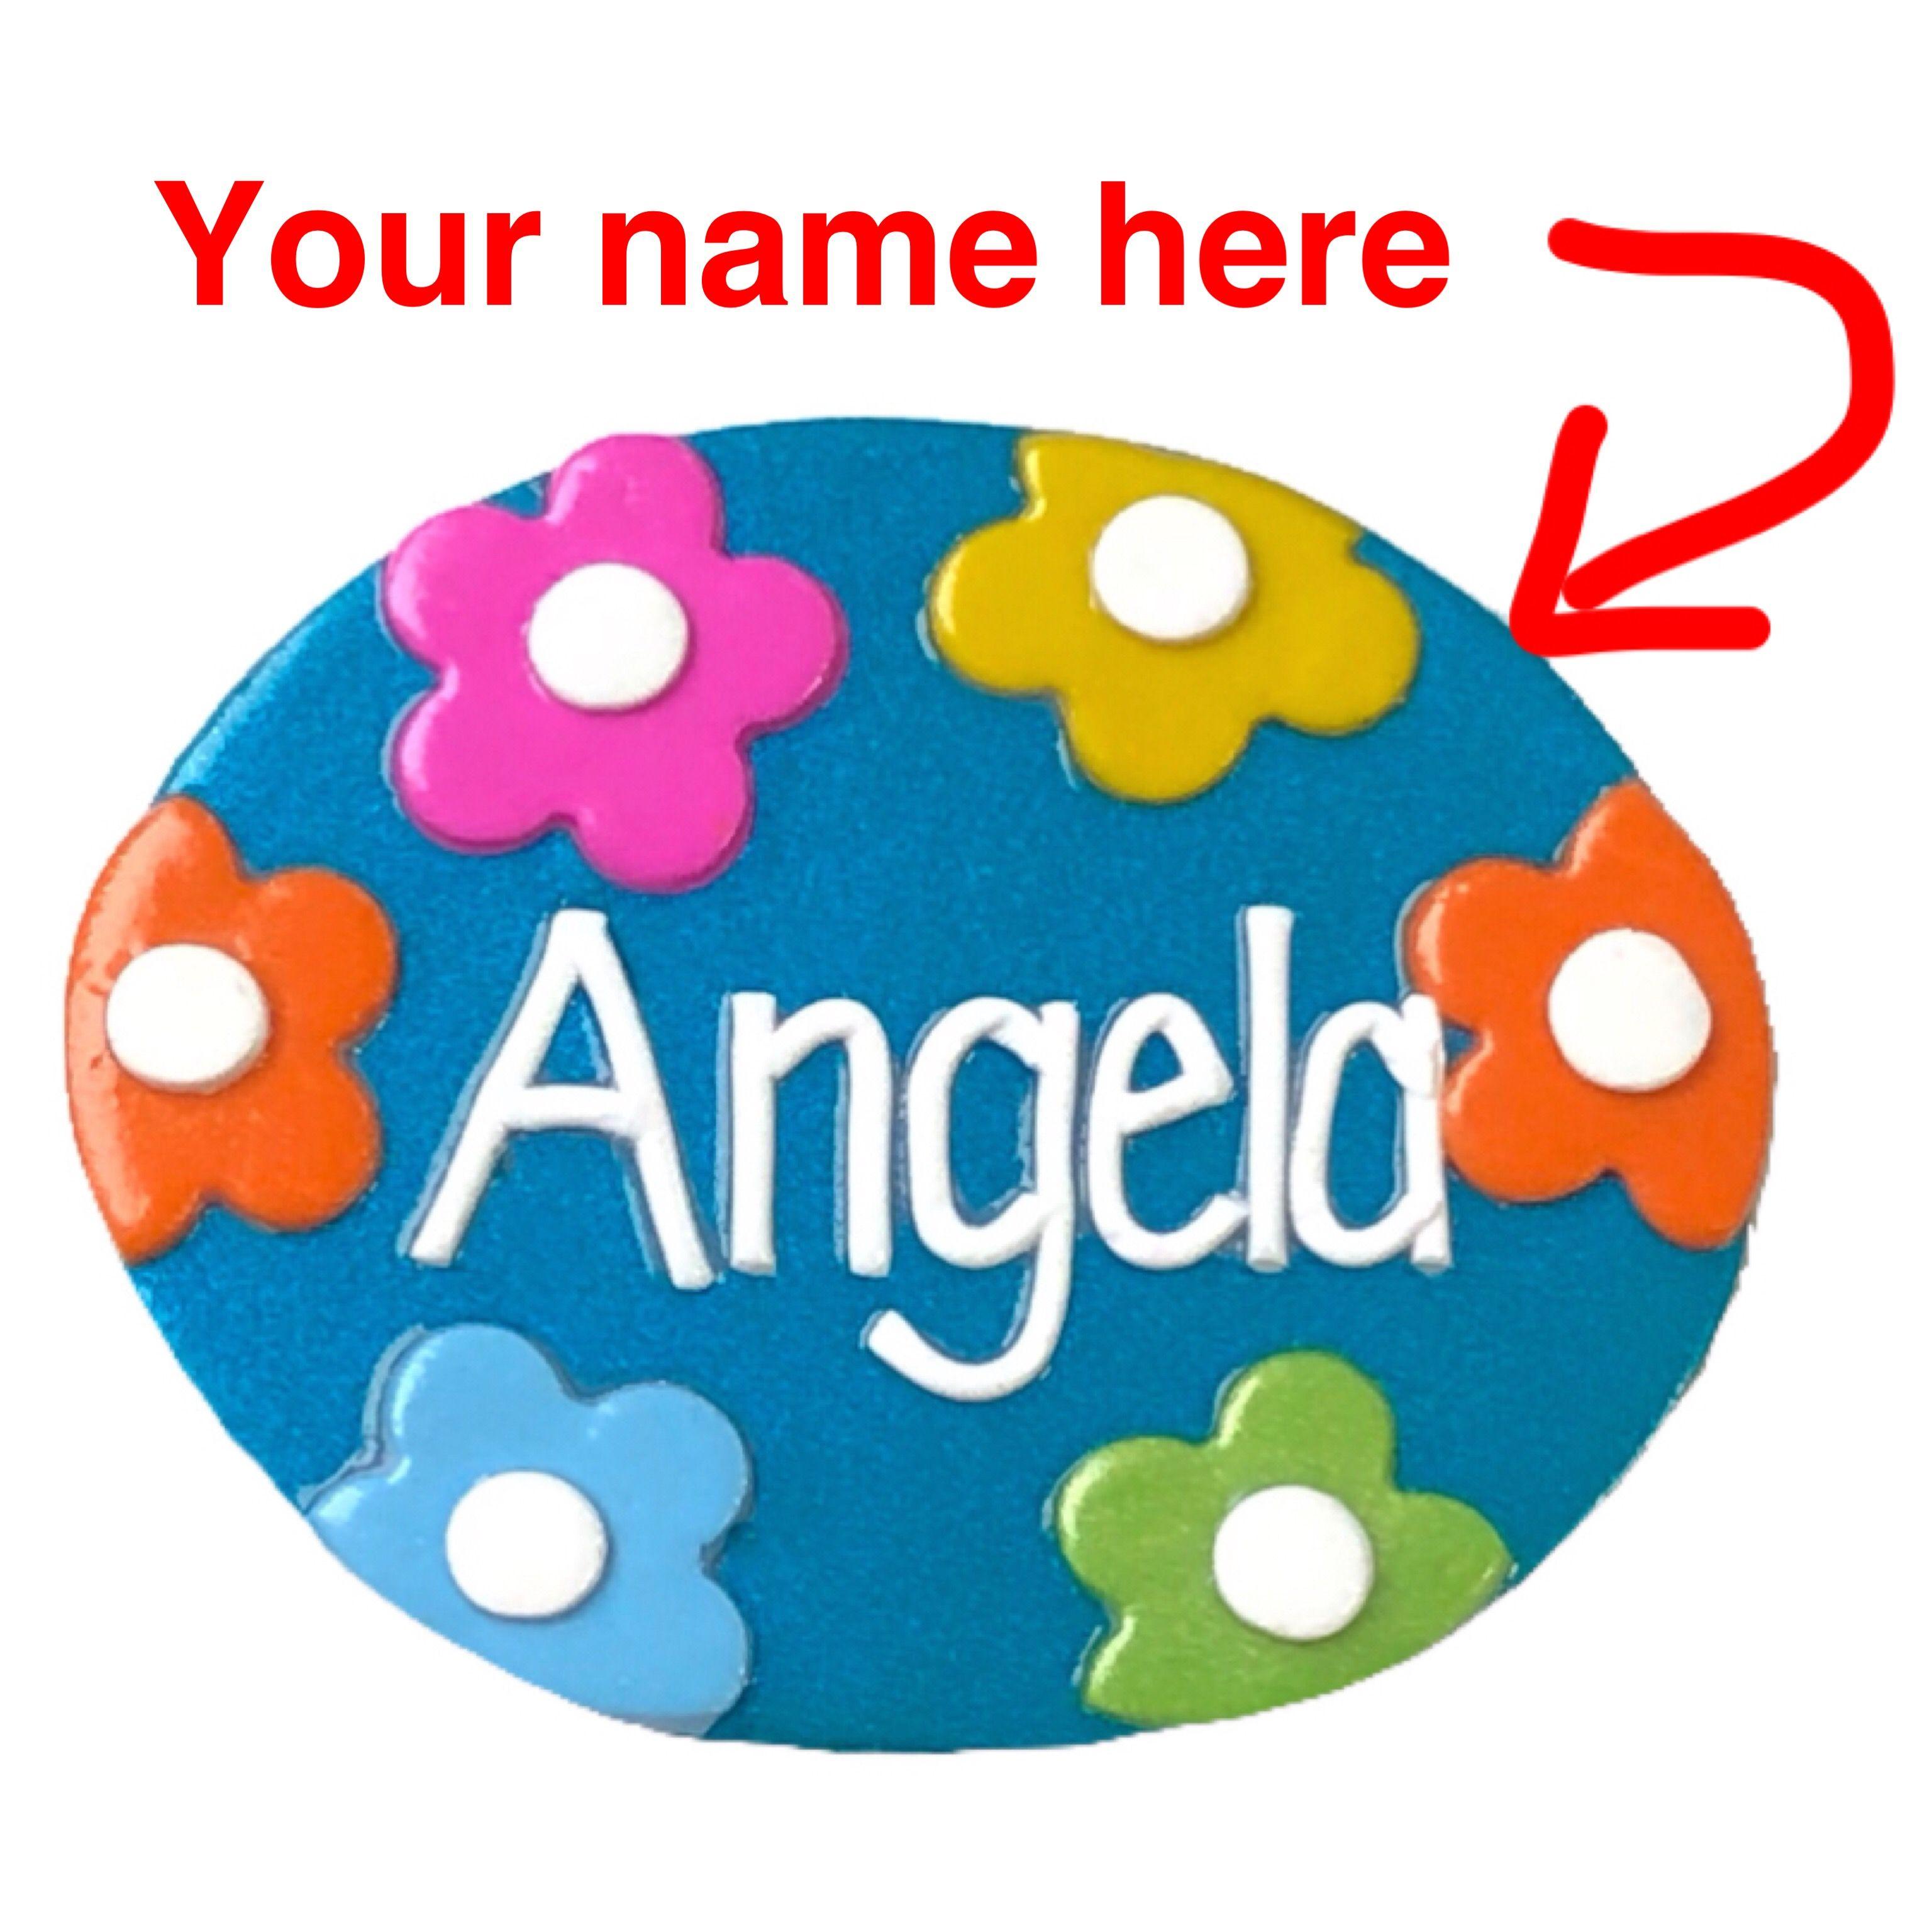 Name badge name badges badge personalised